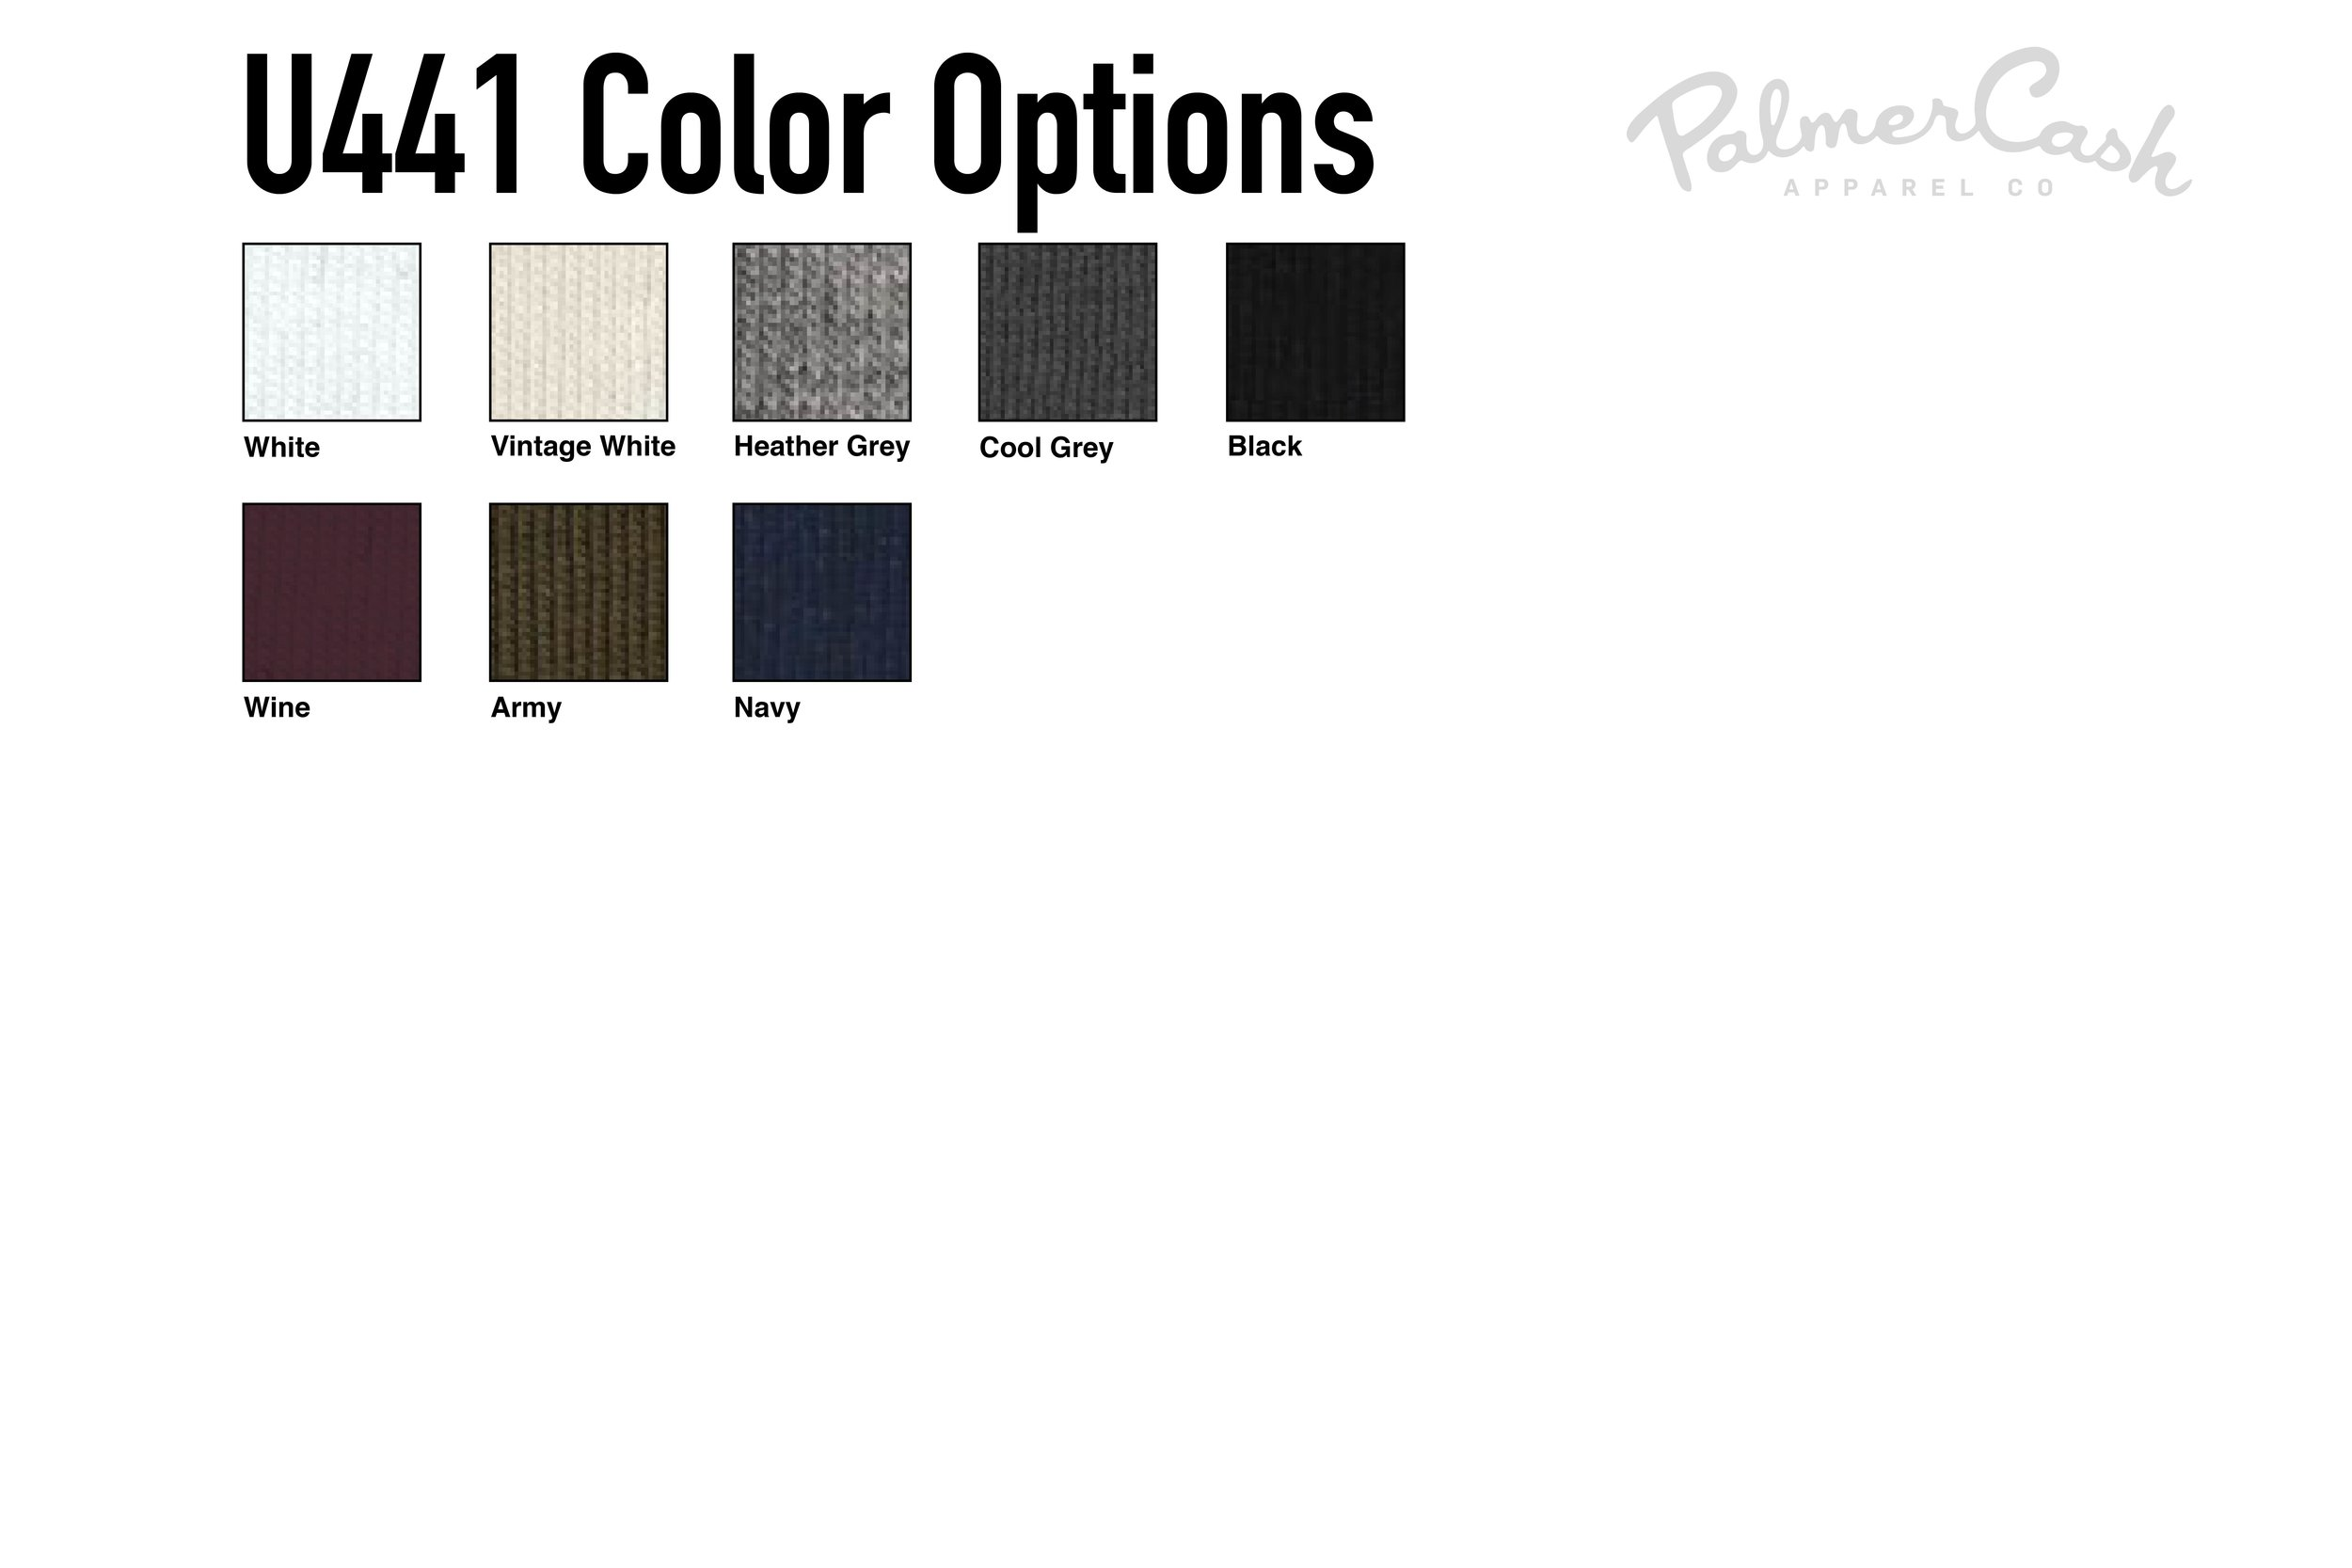 PC_U441_NoCamo_Color_Options-01.jpg